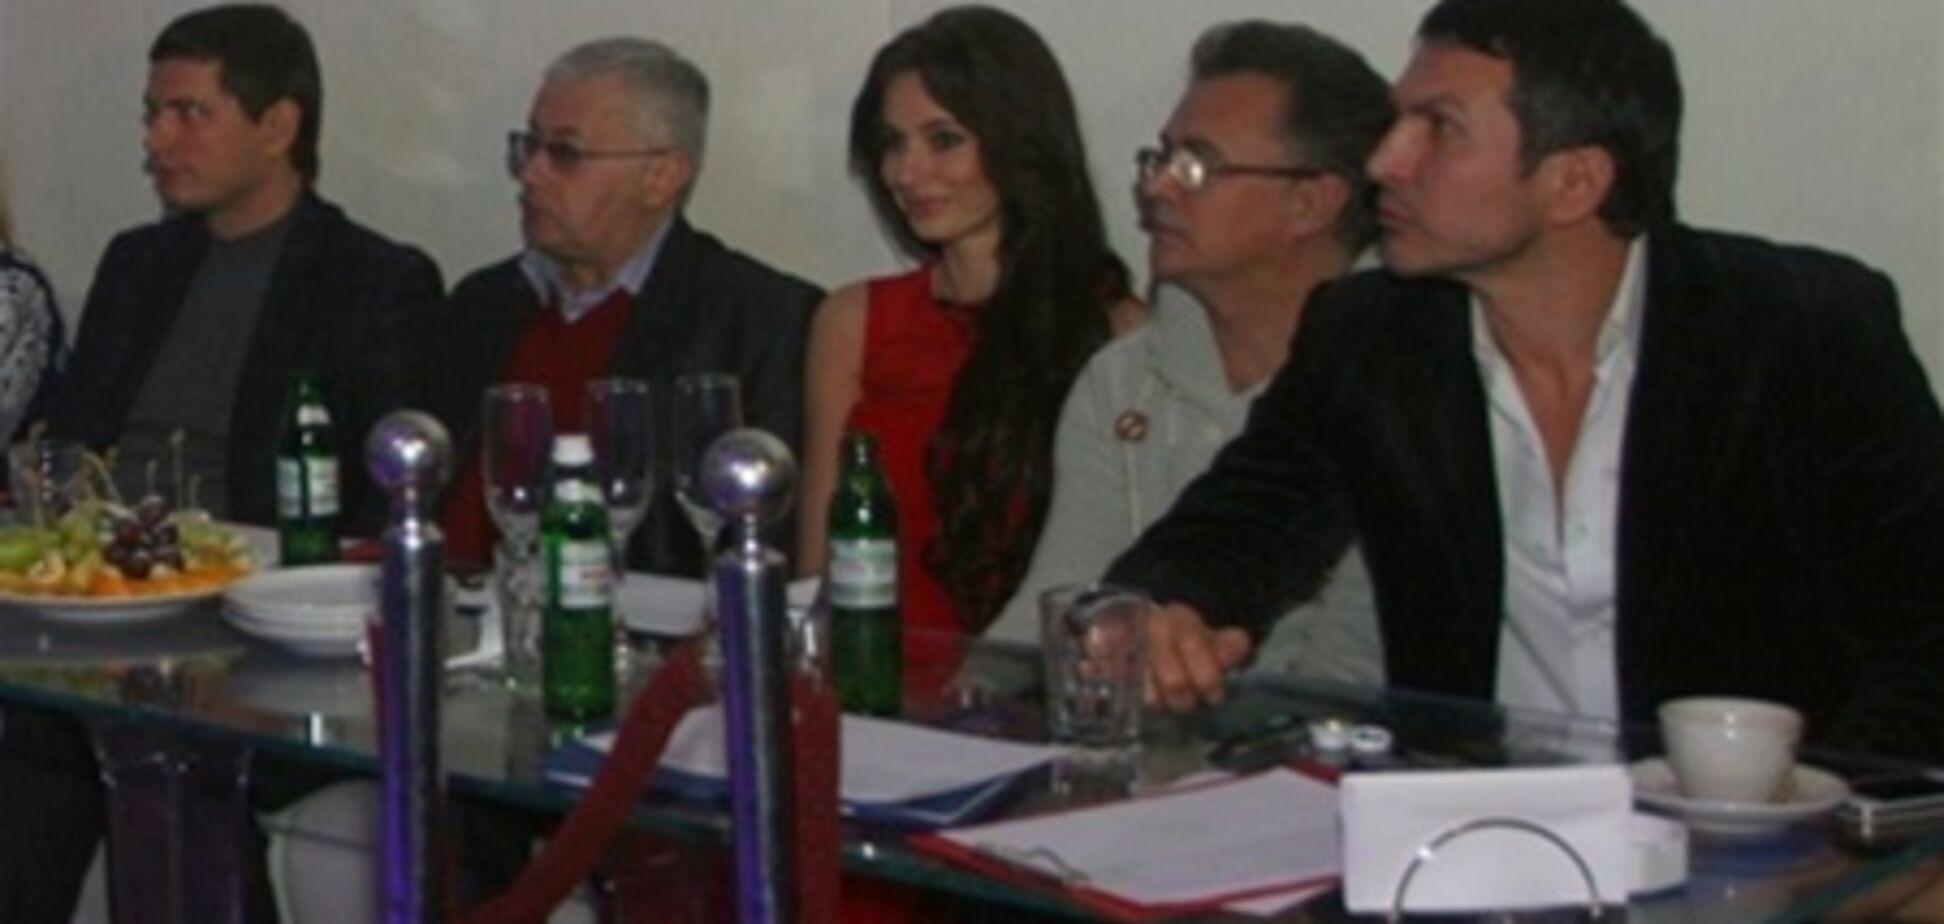 VIP-кастинг: красоток оценили Фалеса, Свобода и Матяш. Фото. Видео